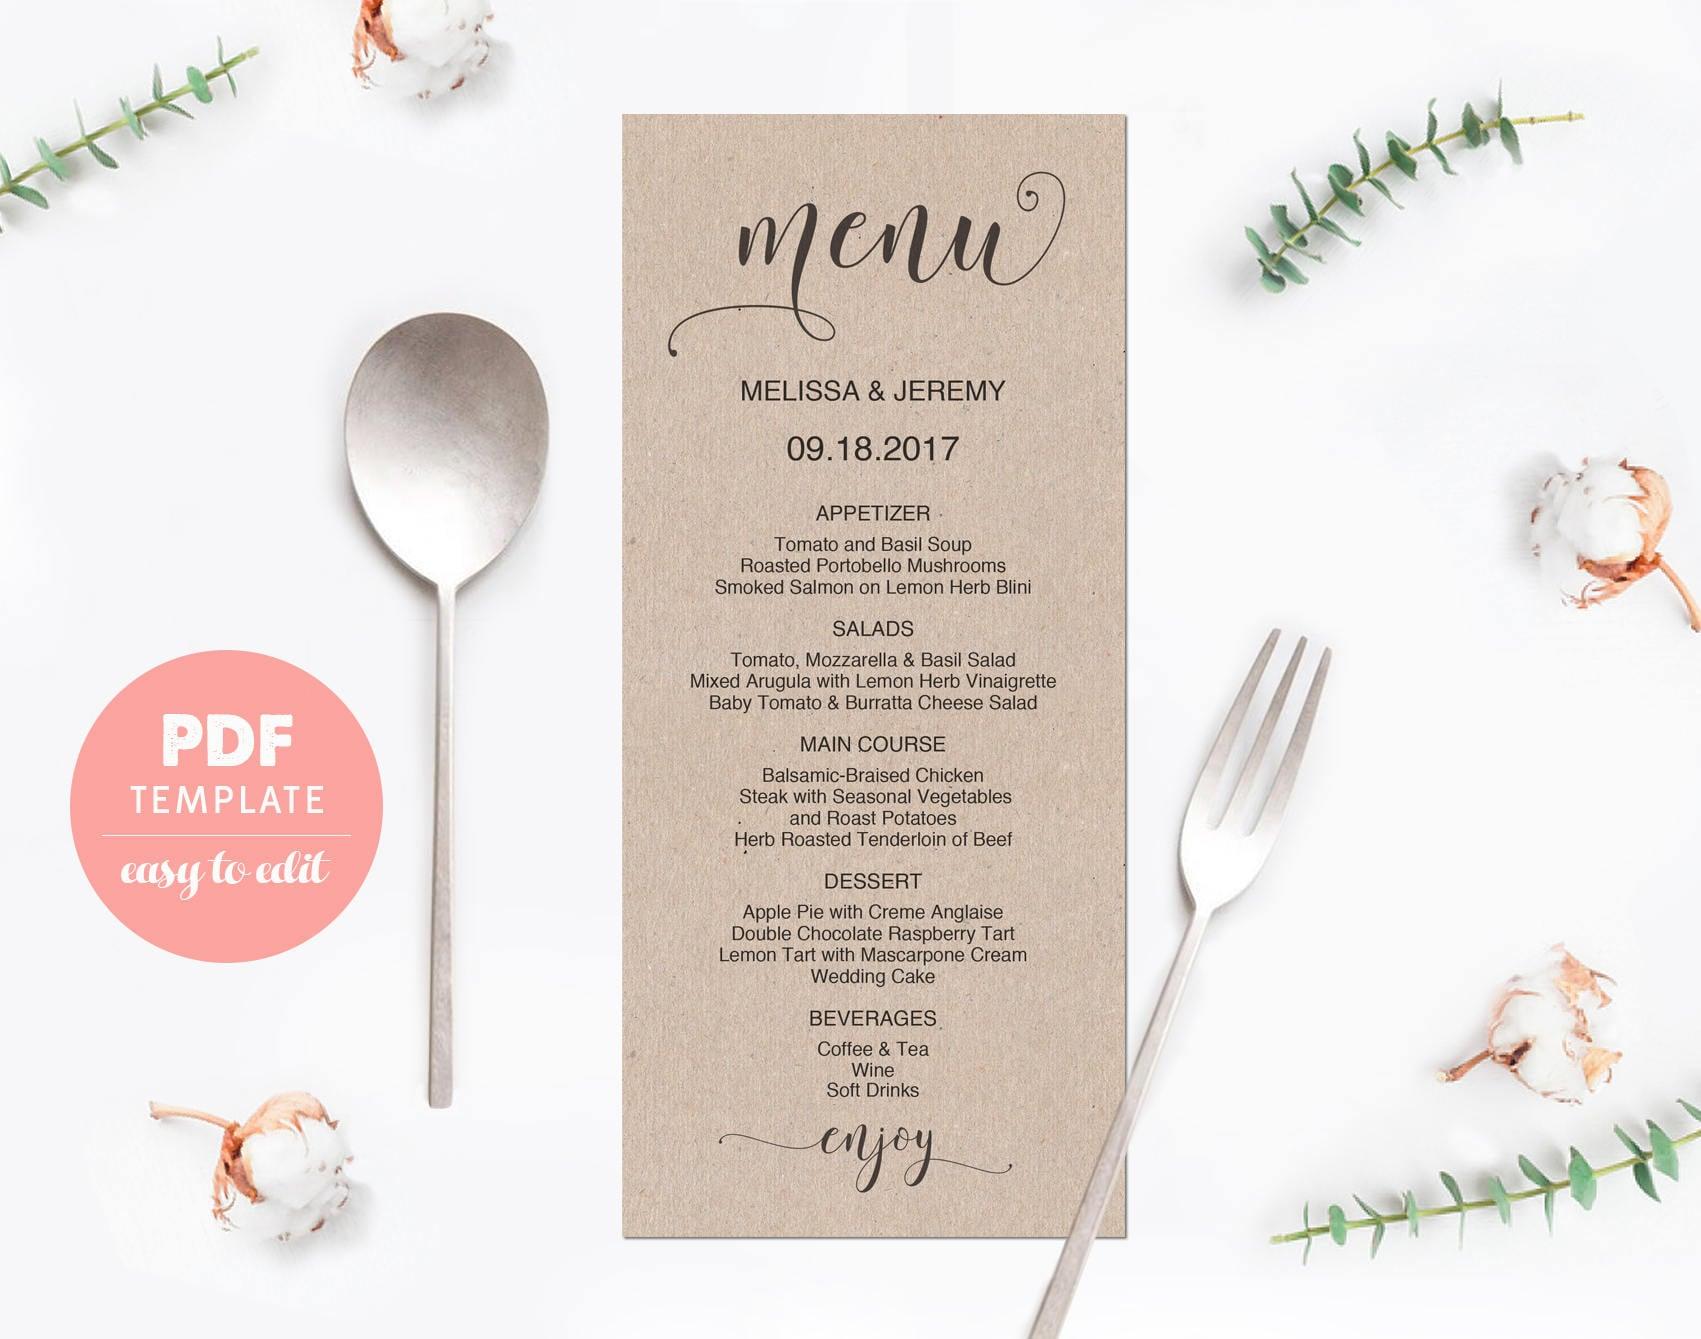 wedding menu card wedding menu template card editable pdf. Black Bedroom Furniture Sets. Home Design Ideas